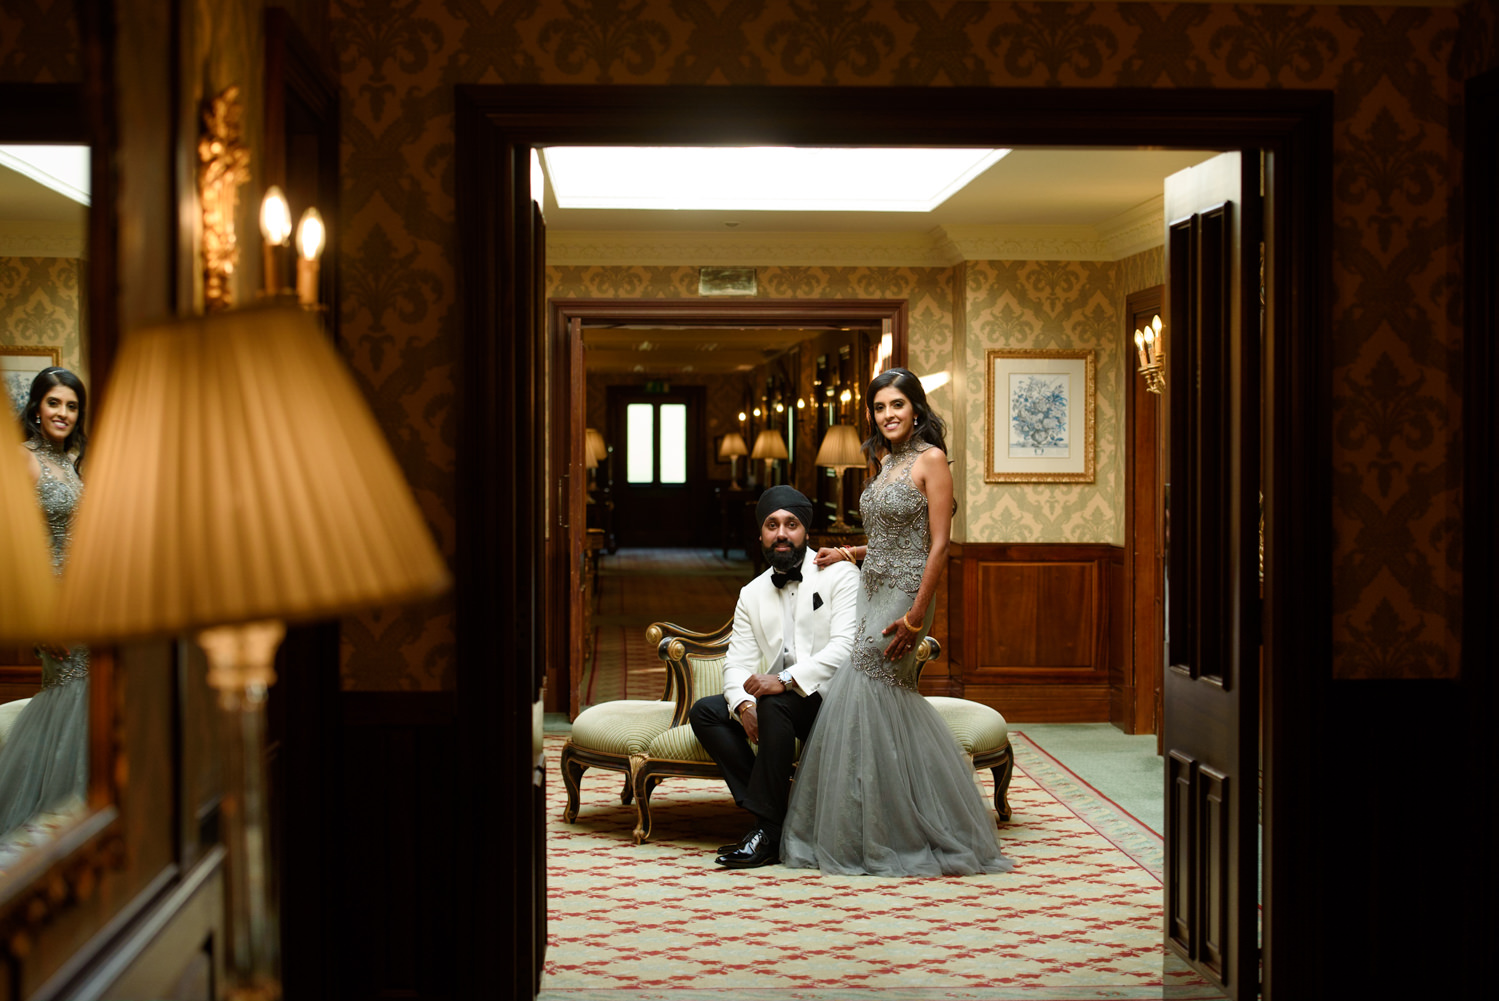 Kilworth House Hotel Wedding21.jpg